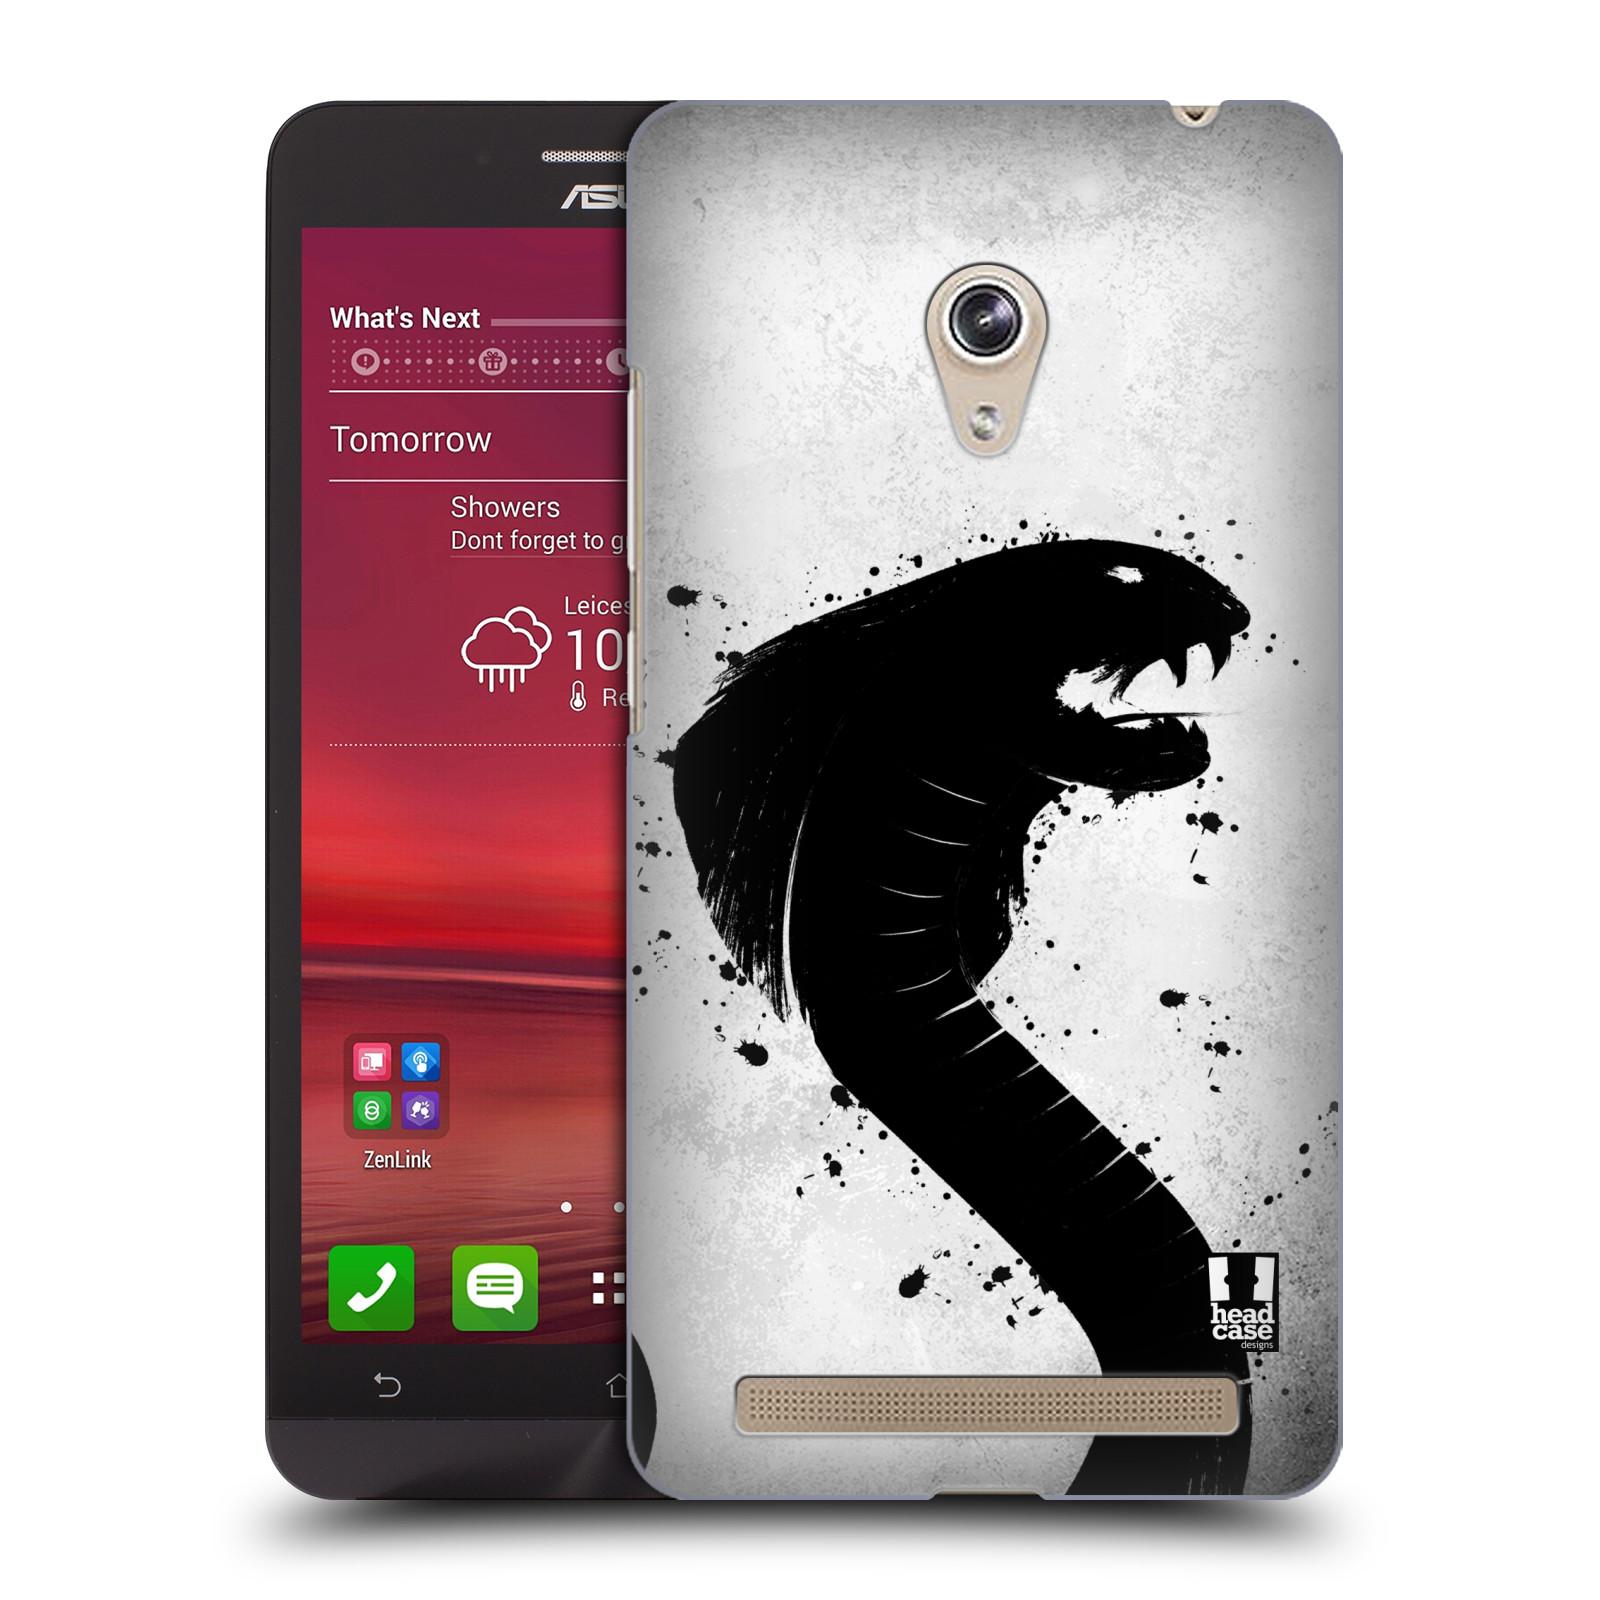 HEAD CASE plastový obal na mobil Asus Zenfone 6 vzor Kresba tuš zvíře had kobra